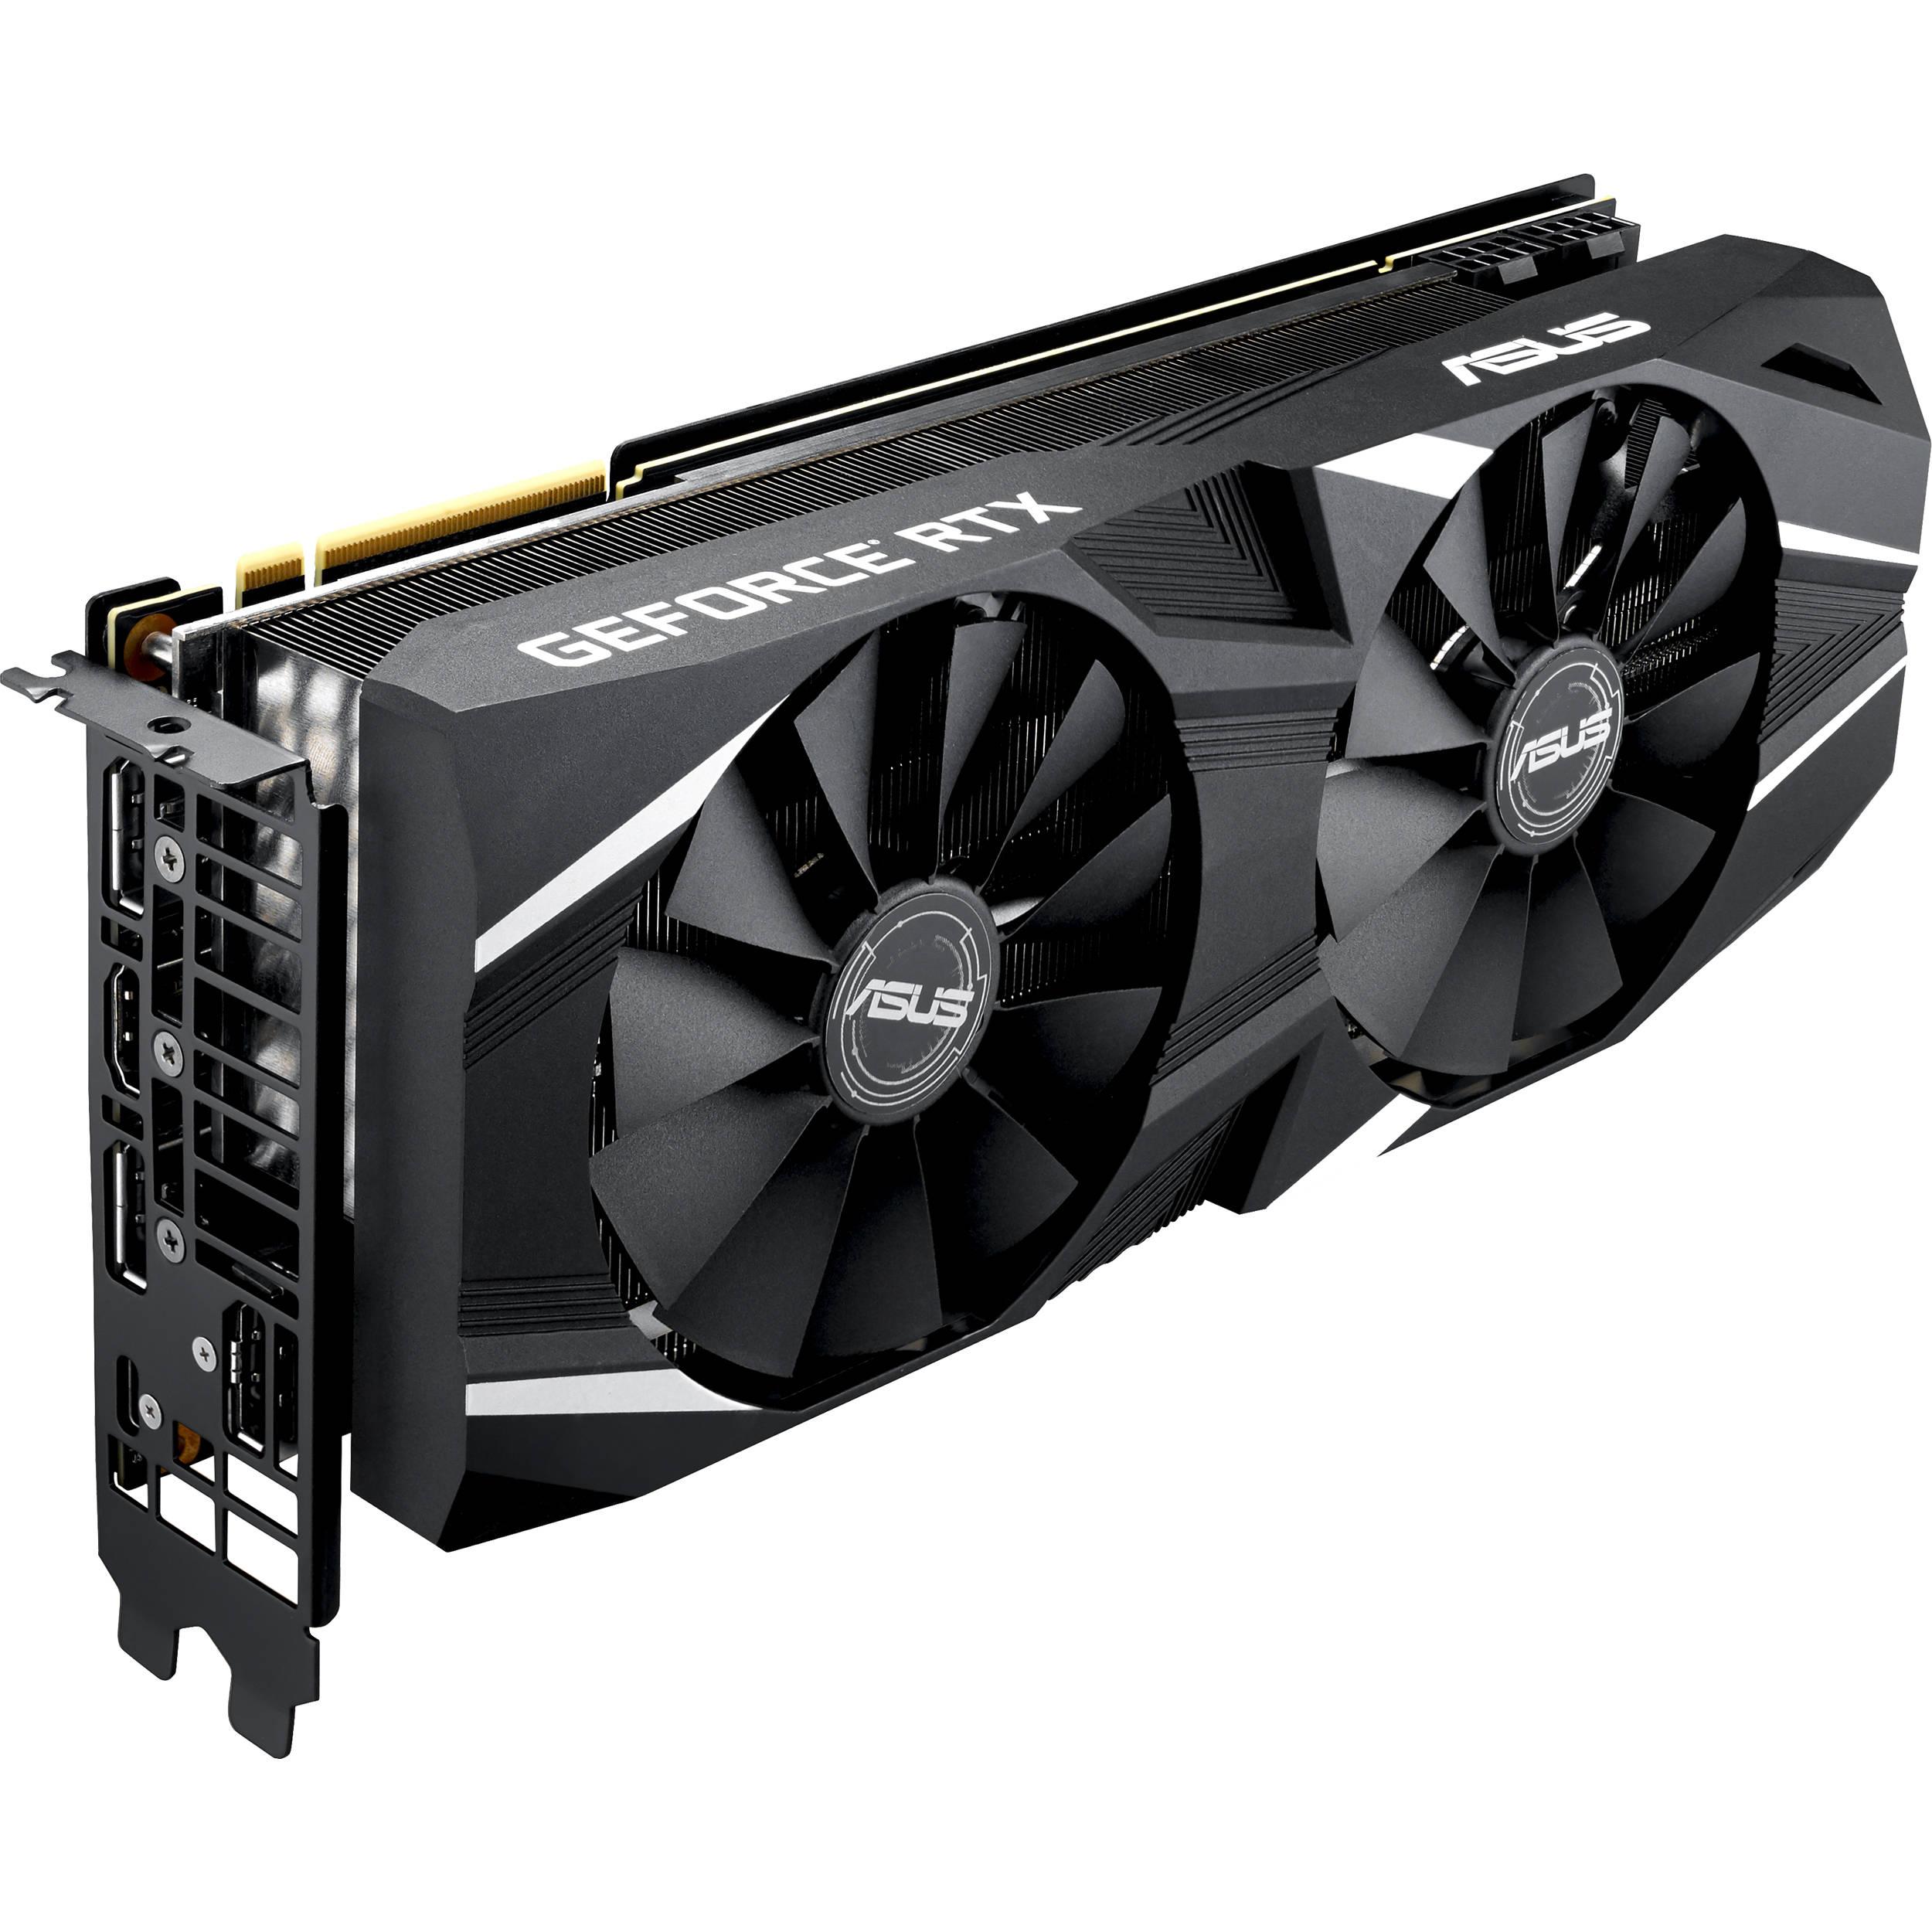 ASUS Dual GeForce RTX 2080 Ti OC Edition Graphics Card